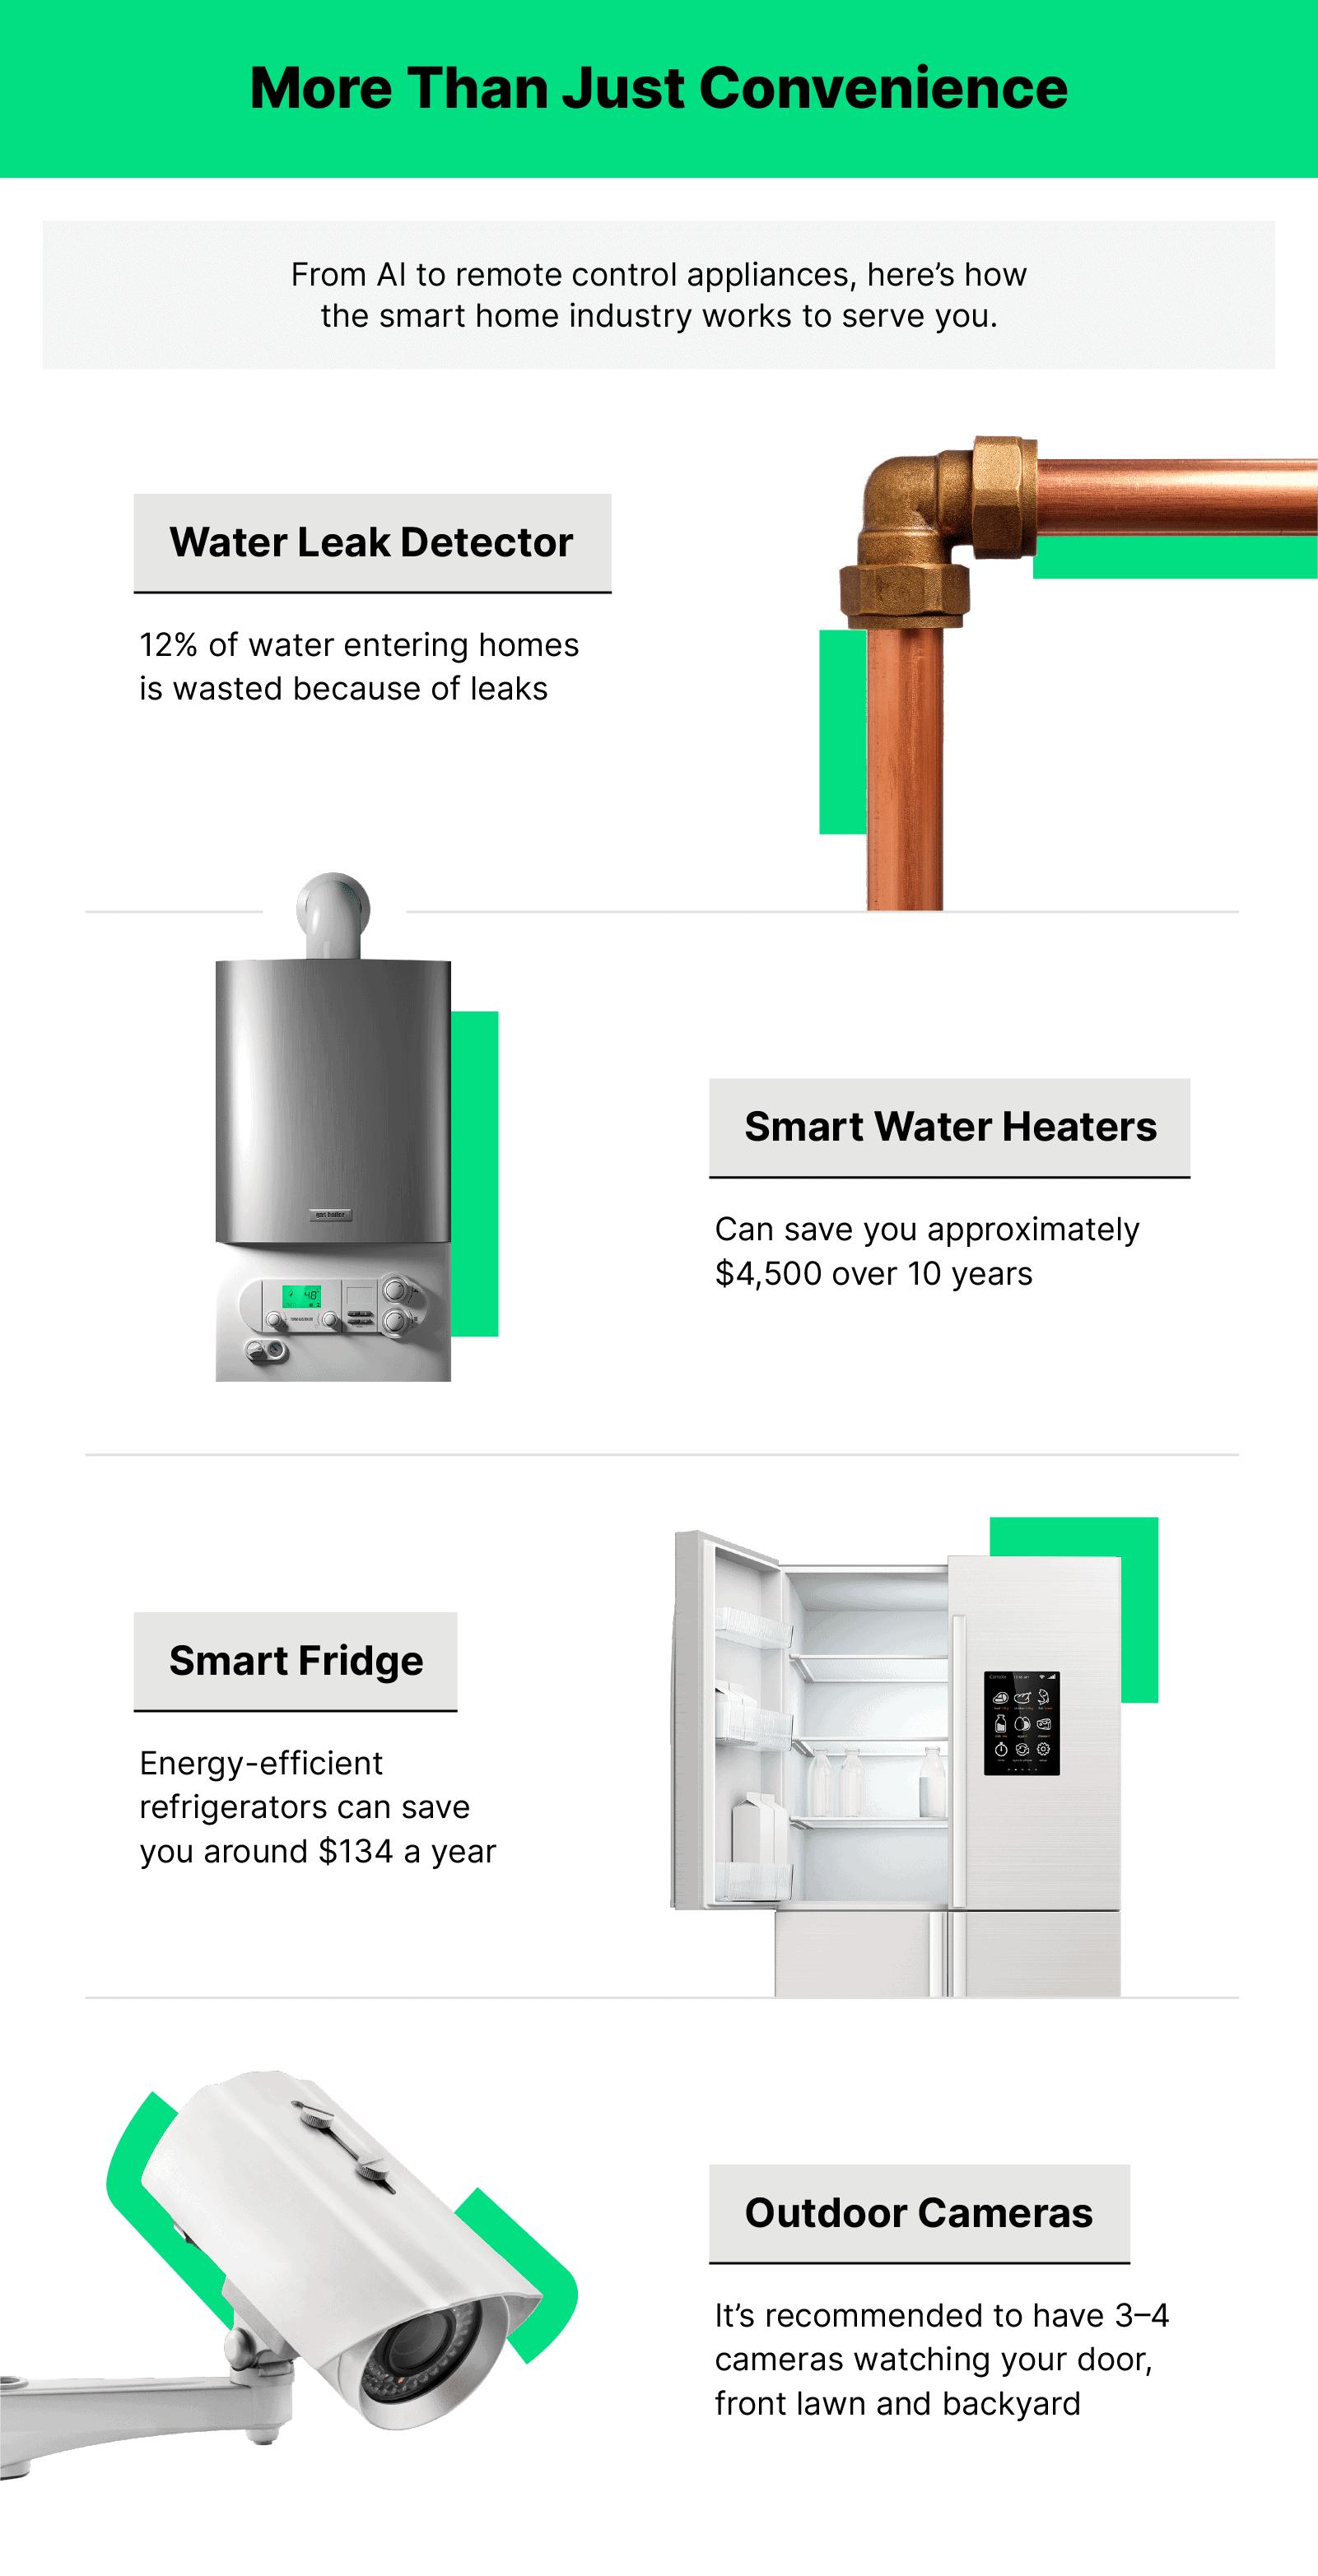 convienence-smart-home